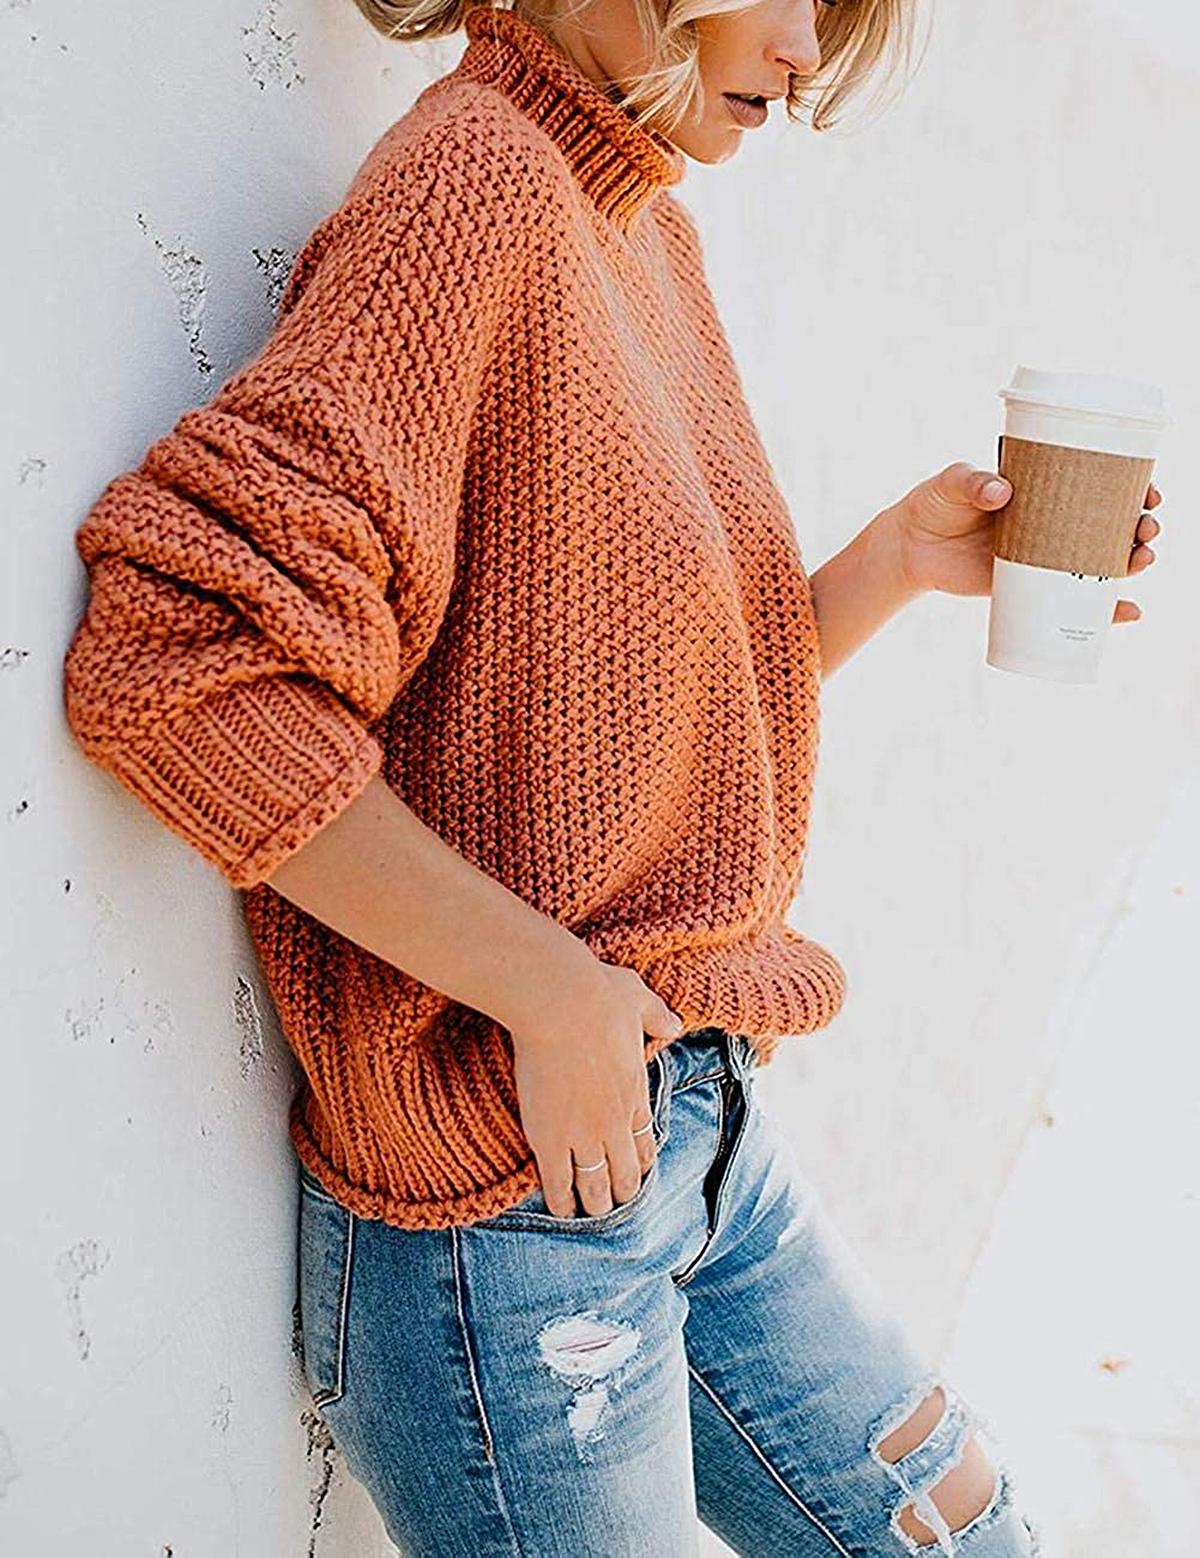 ZESICA Turtleneck Long Batwing Sleeve Sweater